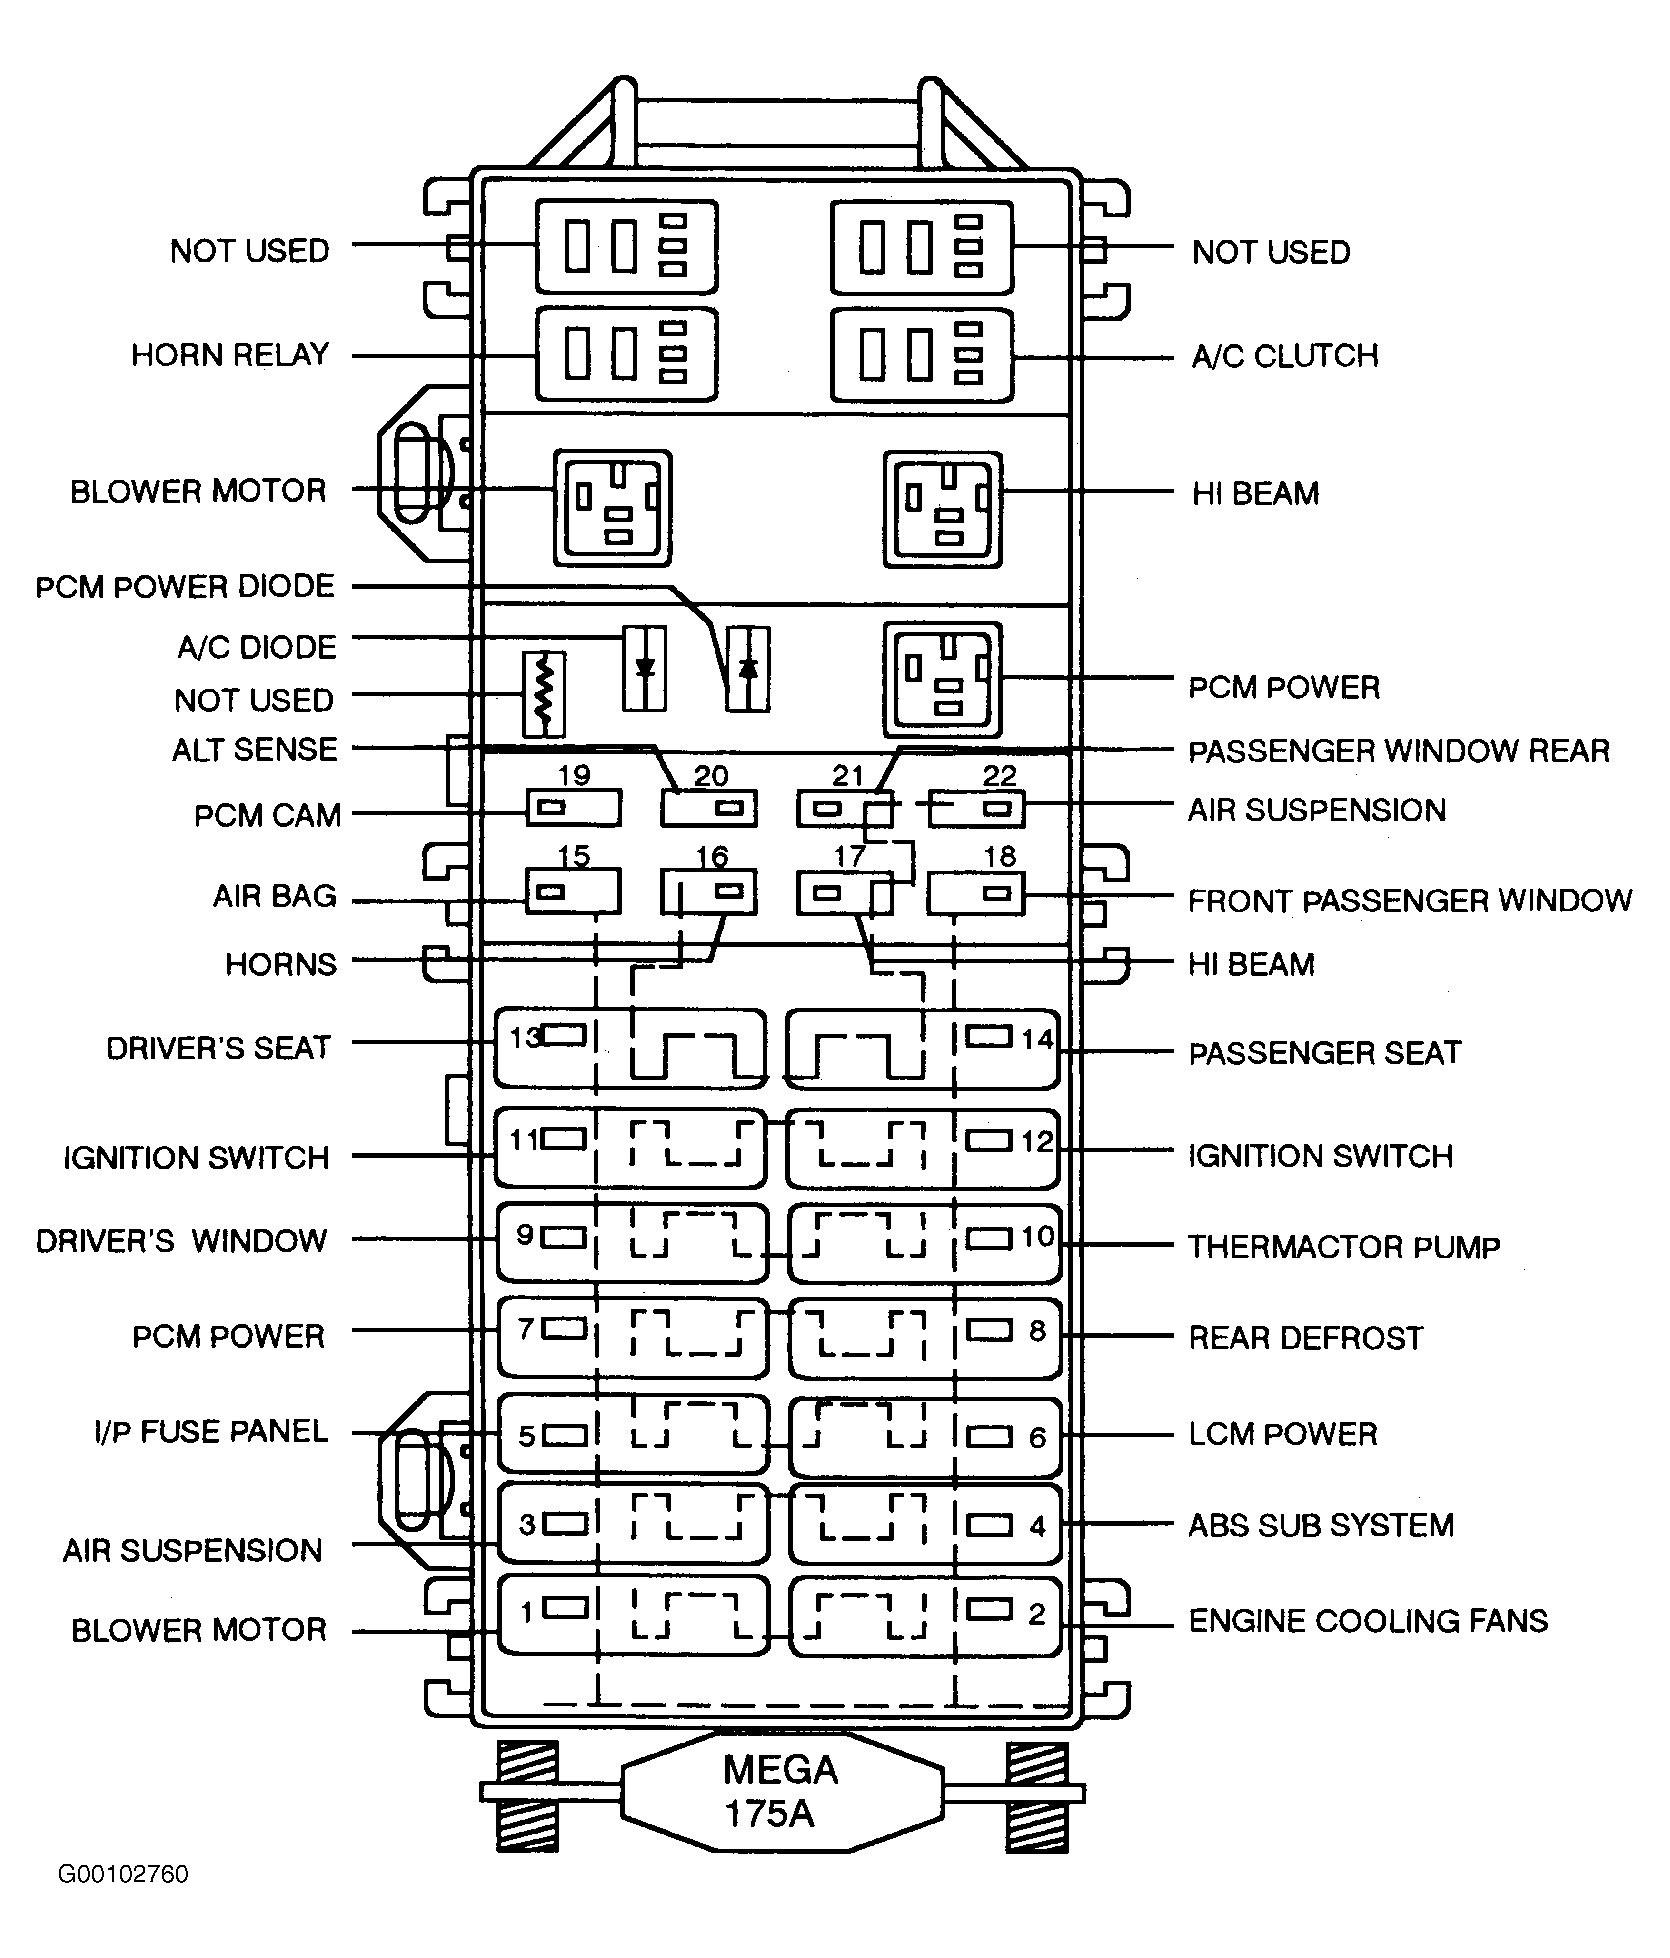 2000 Lincoln Town Car Wiring Diagram 2000 F250 Fuse Diagram And Description For Wiring Diagram Schematics